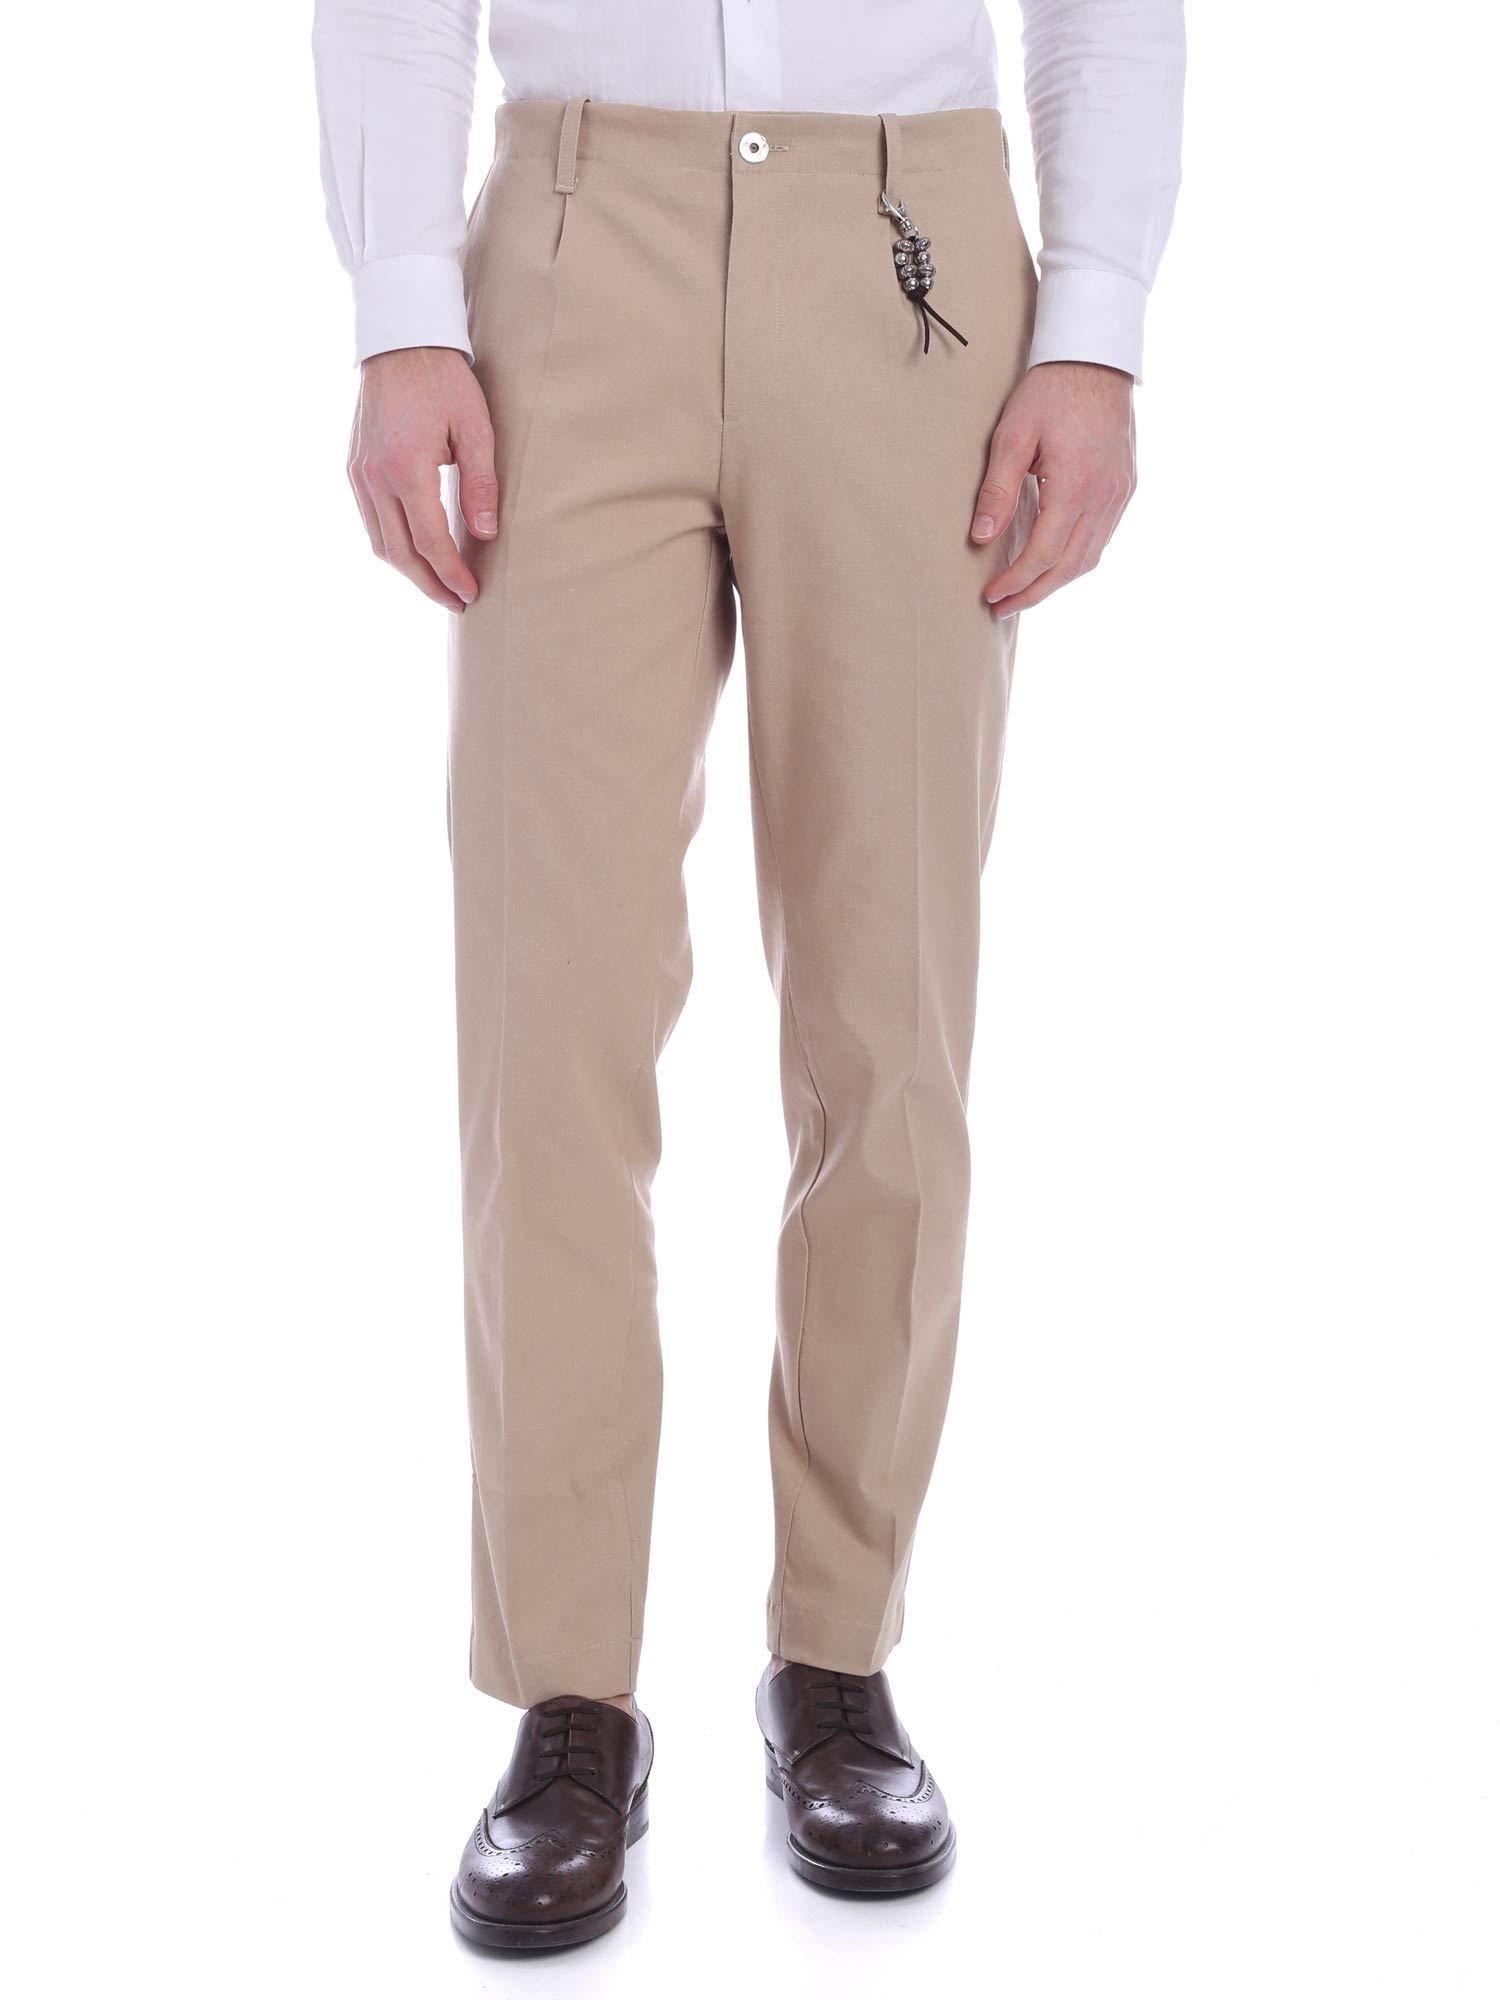 Image of Pantalone denim orzo una pence D-OR